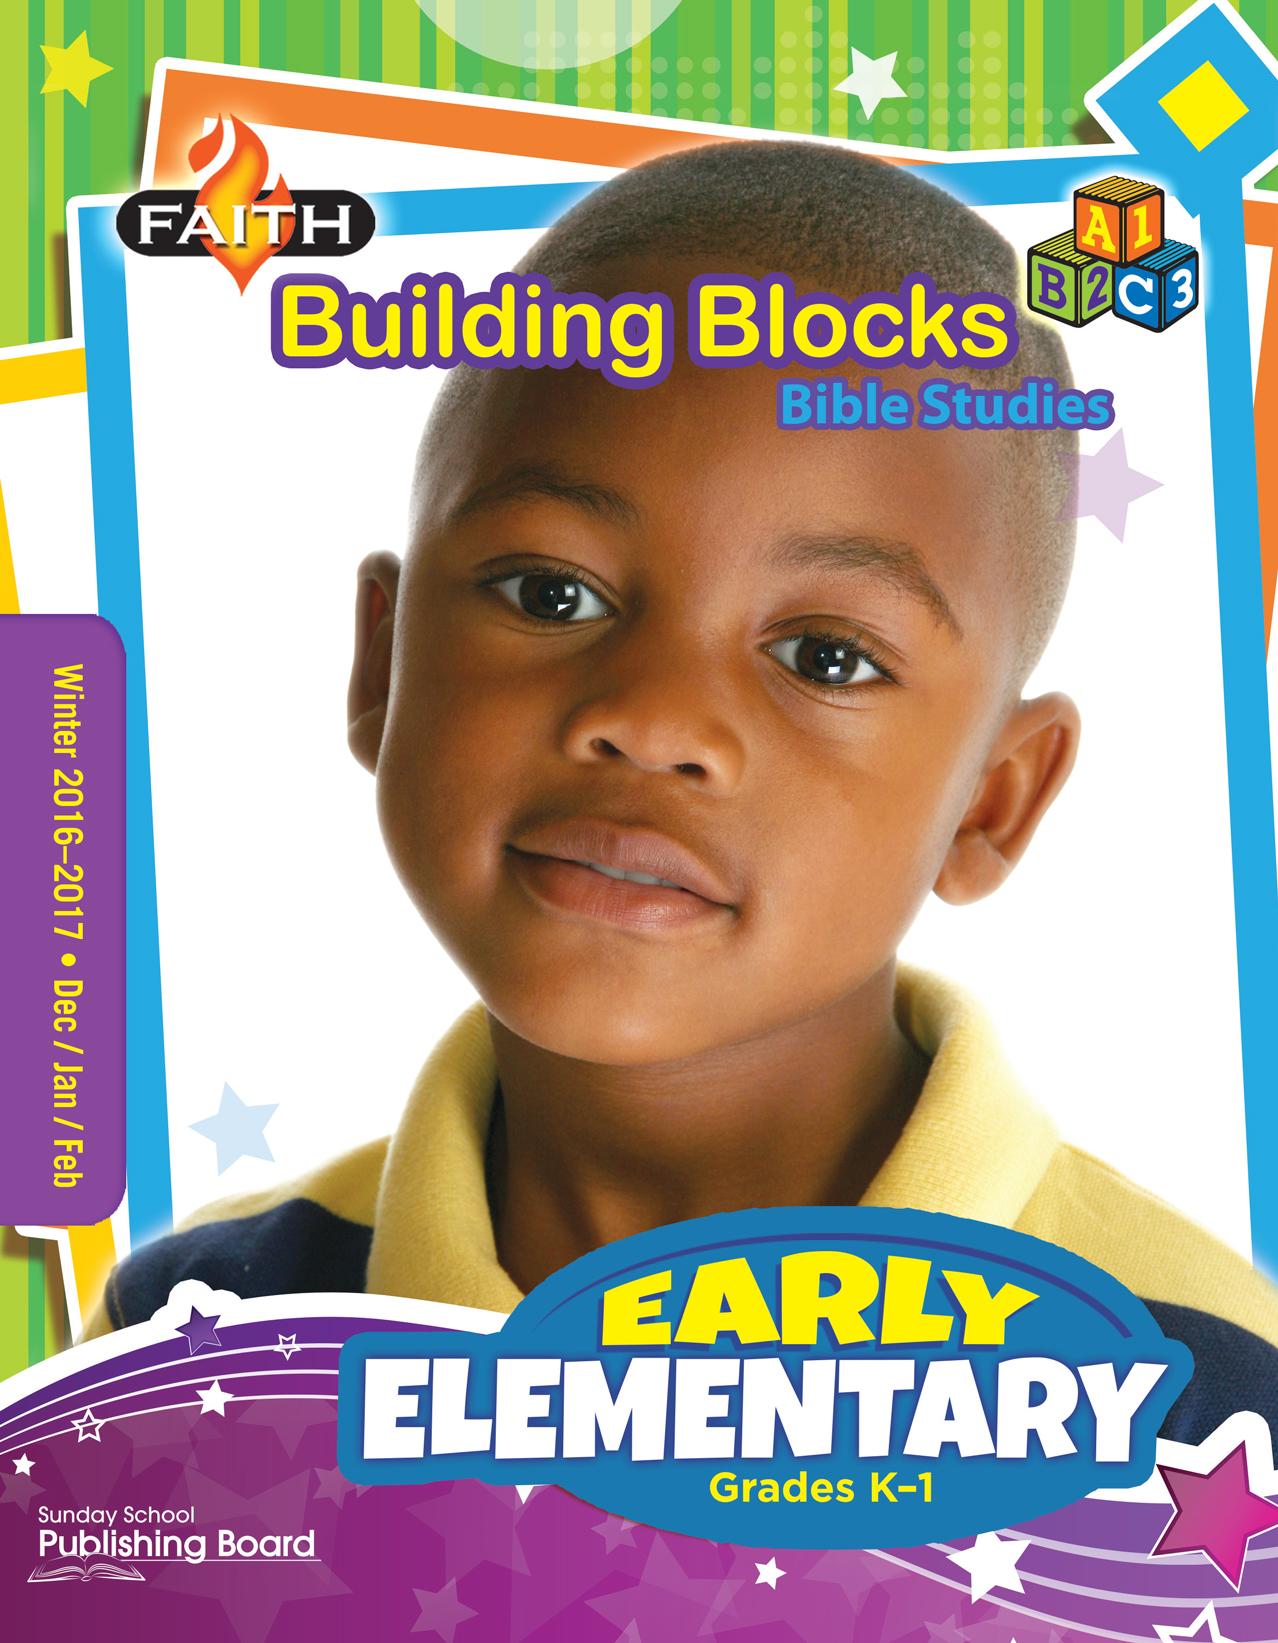 Faith Building Blocks Bible Stu S Early Elementary